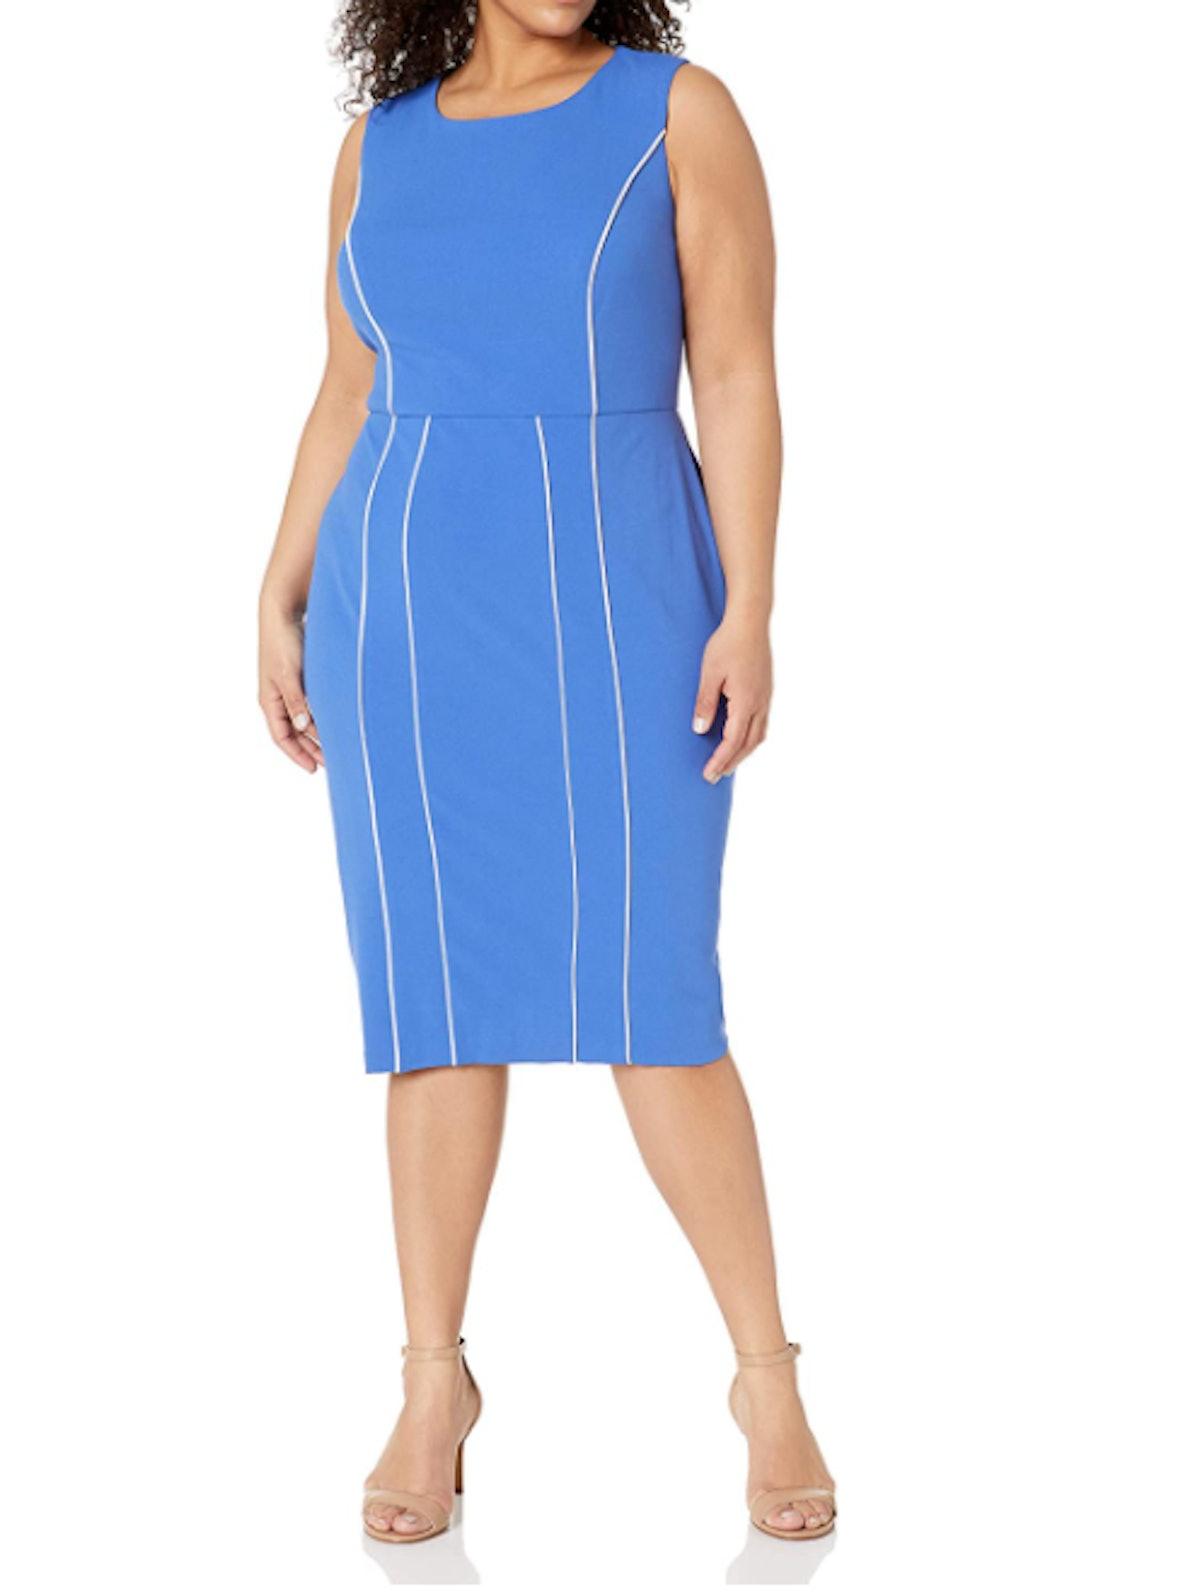 Donna Morgan Plus-Size Sleeveless Contrast Piping Sheath Dress